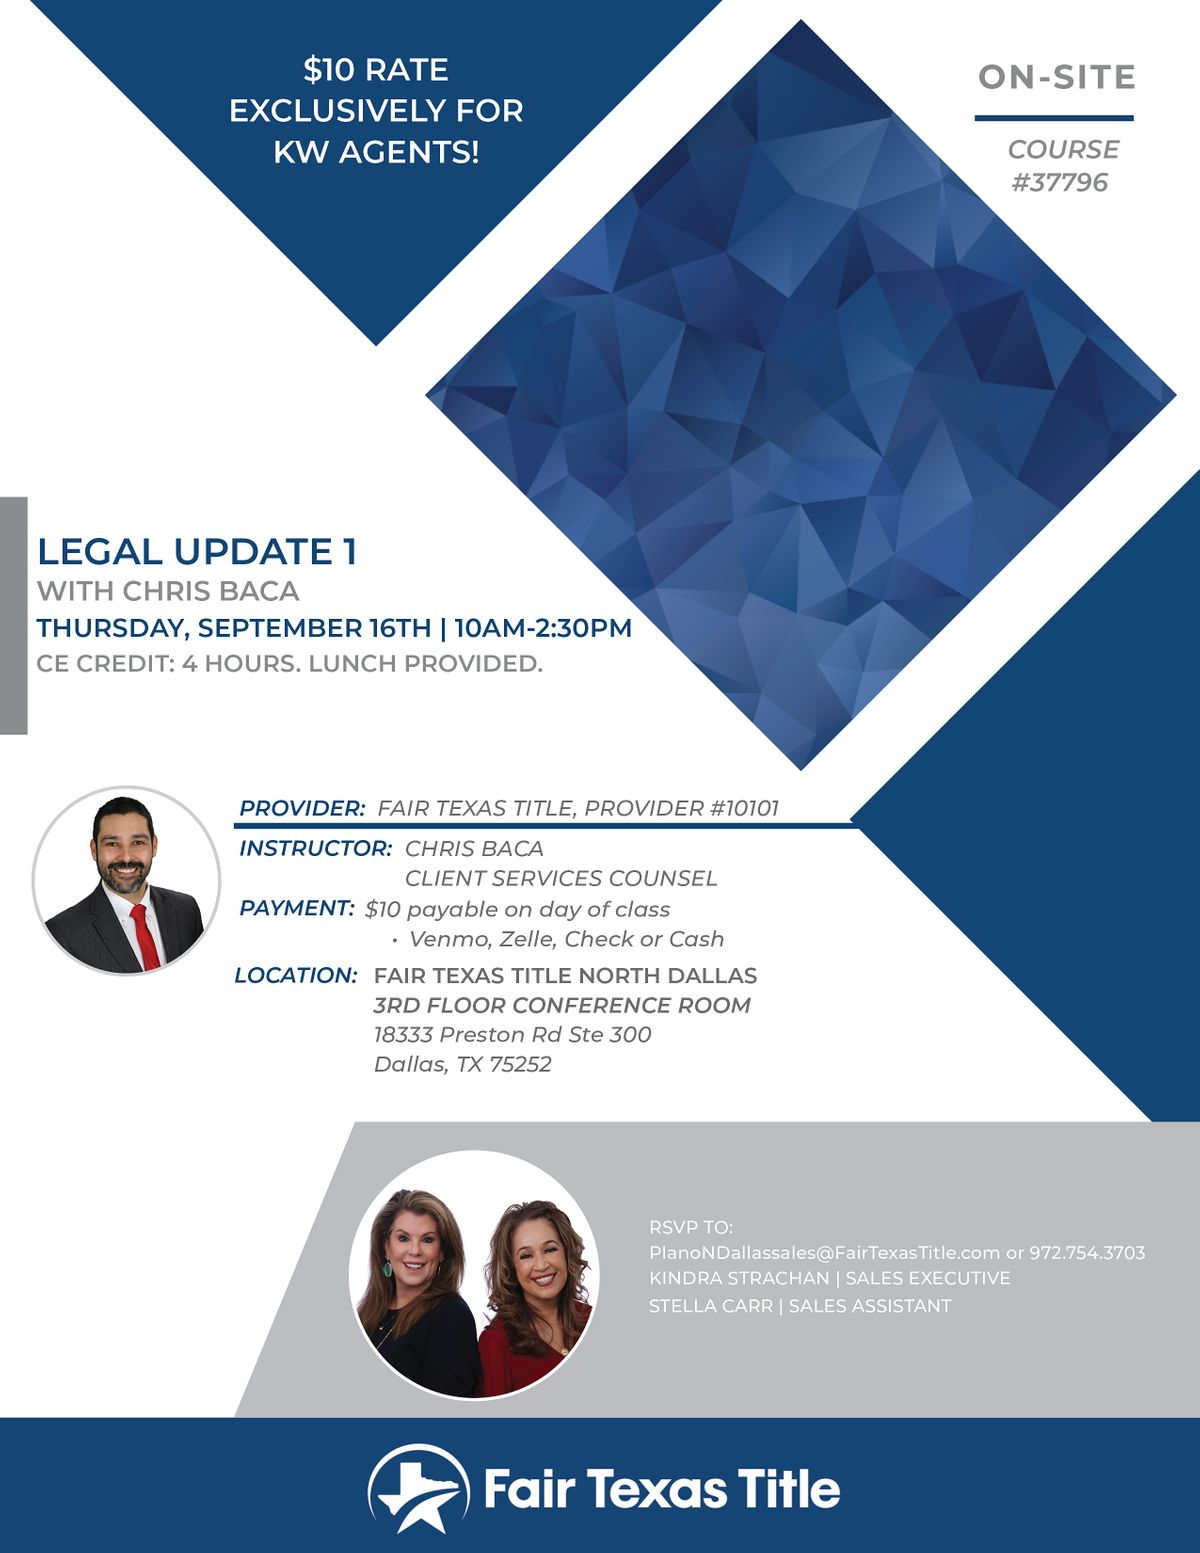 Legal I for Real Estate Agents-Keller Williams DPR Agents